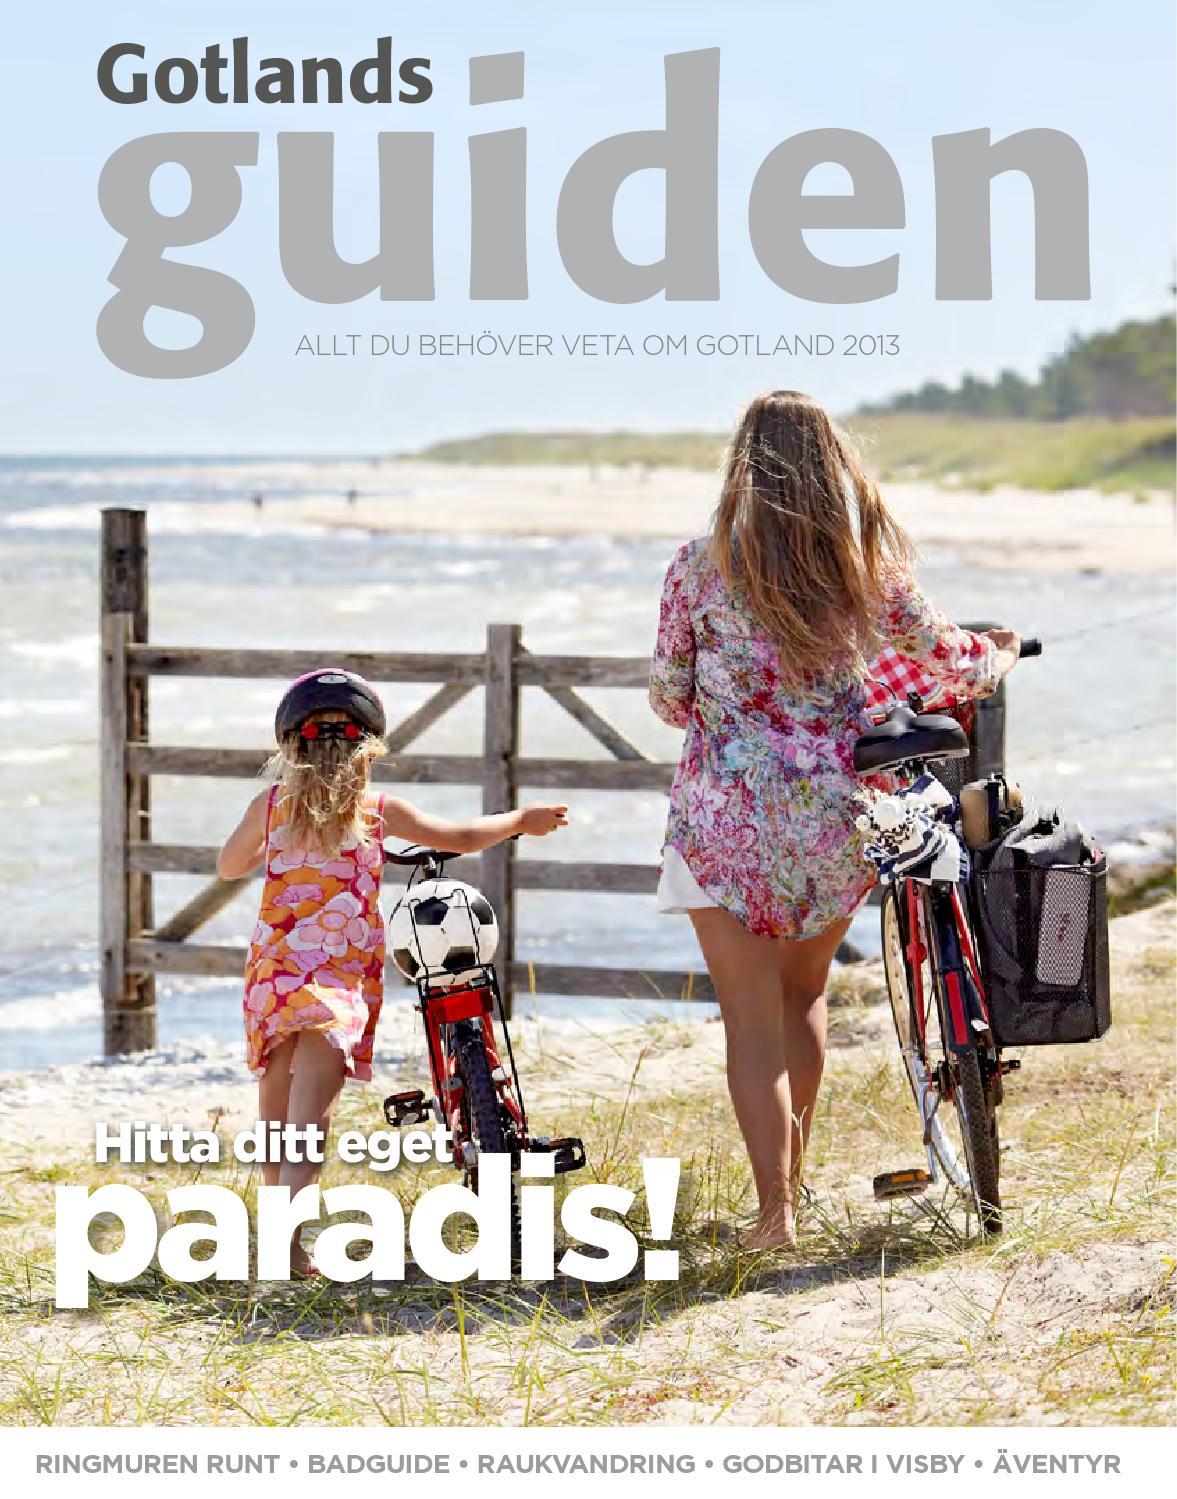 Gotland i siffror - Region Gotland